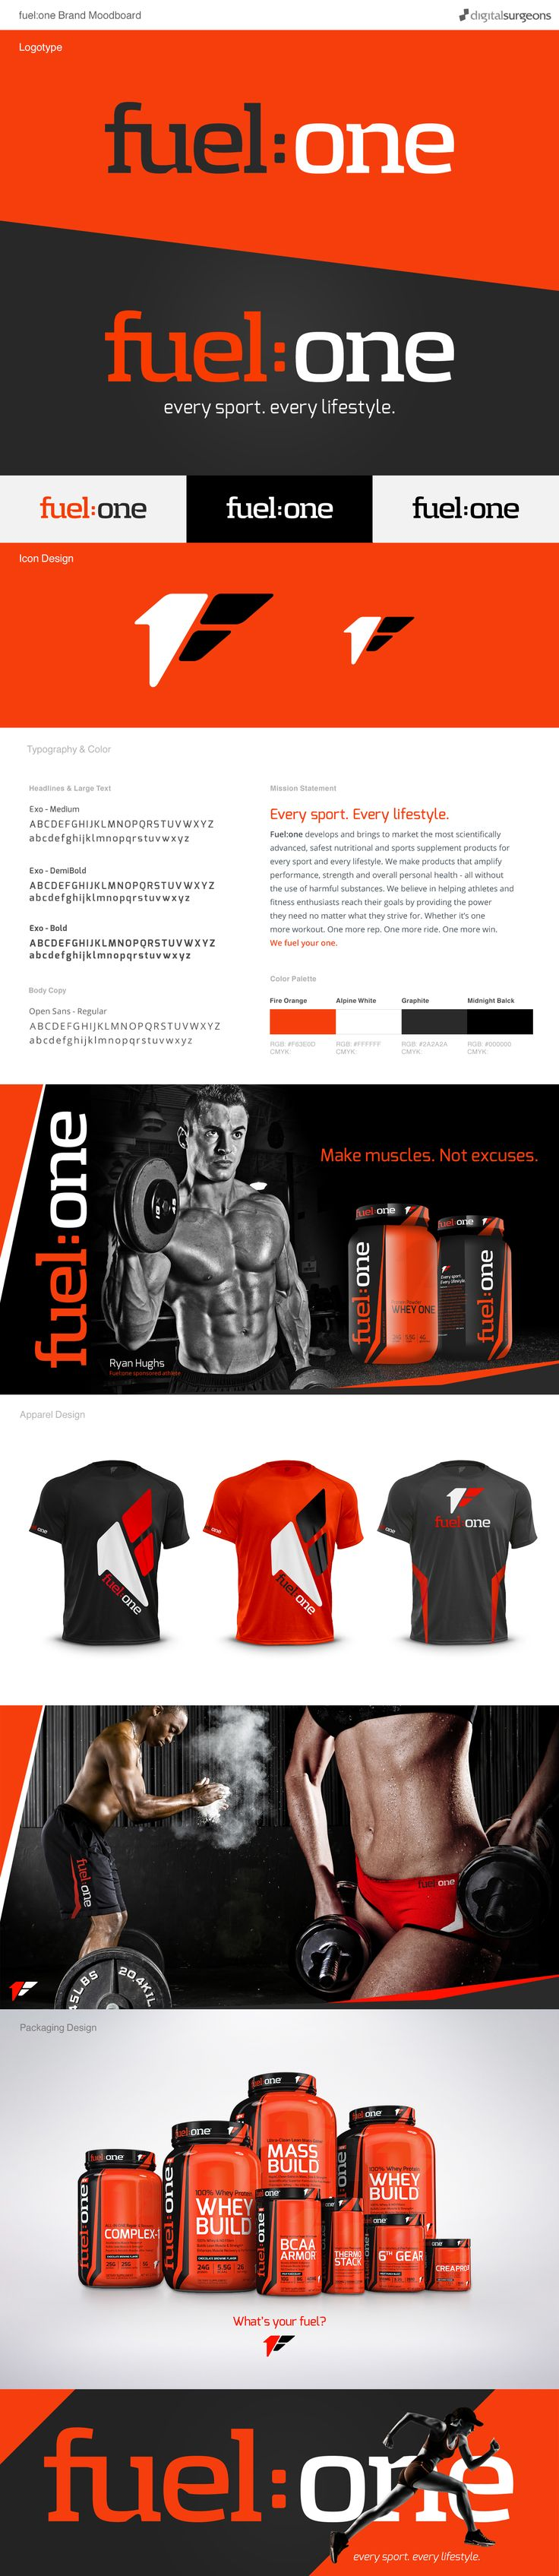 Fuel:one Brand Design https://www.behance.net/gallery/49740639/Fuelone-Branding-Design-Study